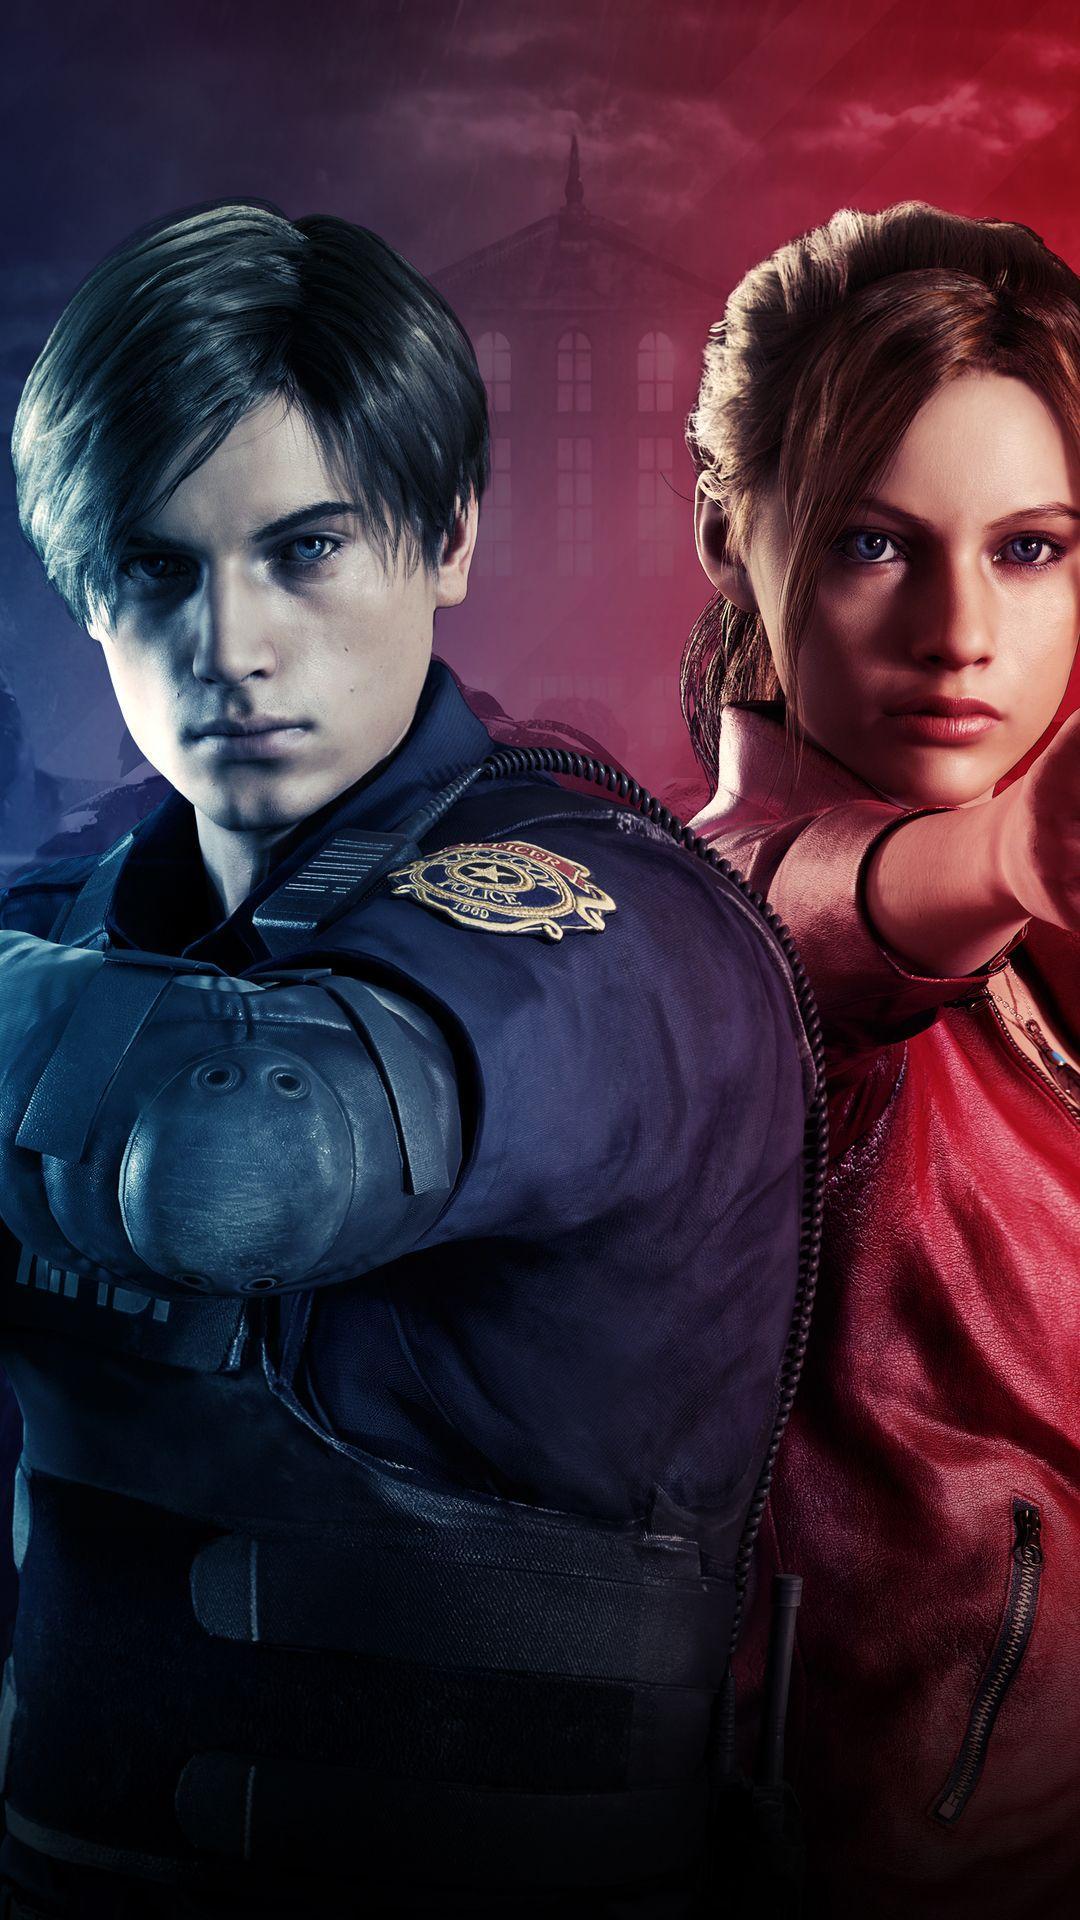 Resident Evil 2 Remake Wallpapers Top Free Resident Evil 2